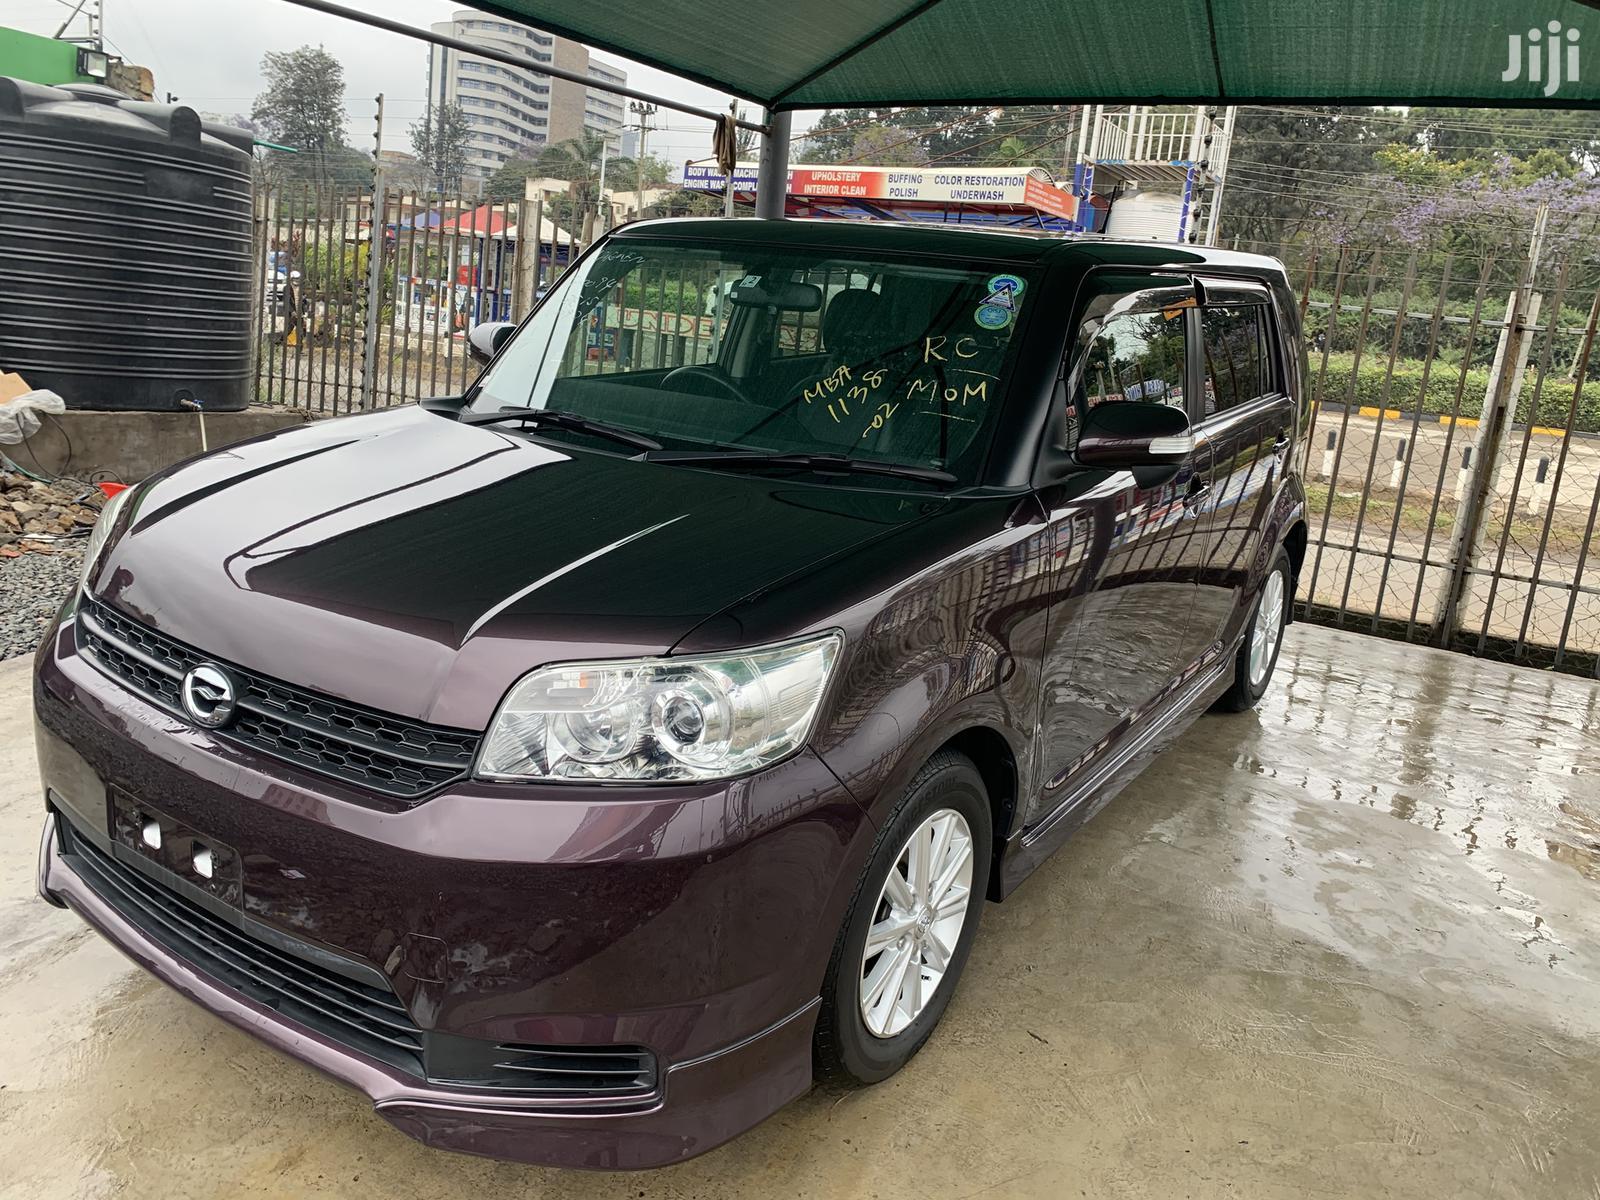 Toyota Corolla Rumion 2013 Hatchback 1.5 FWD Brown | Cars for sale in Nairobi West, Nairobi, Kenya